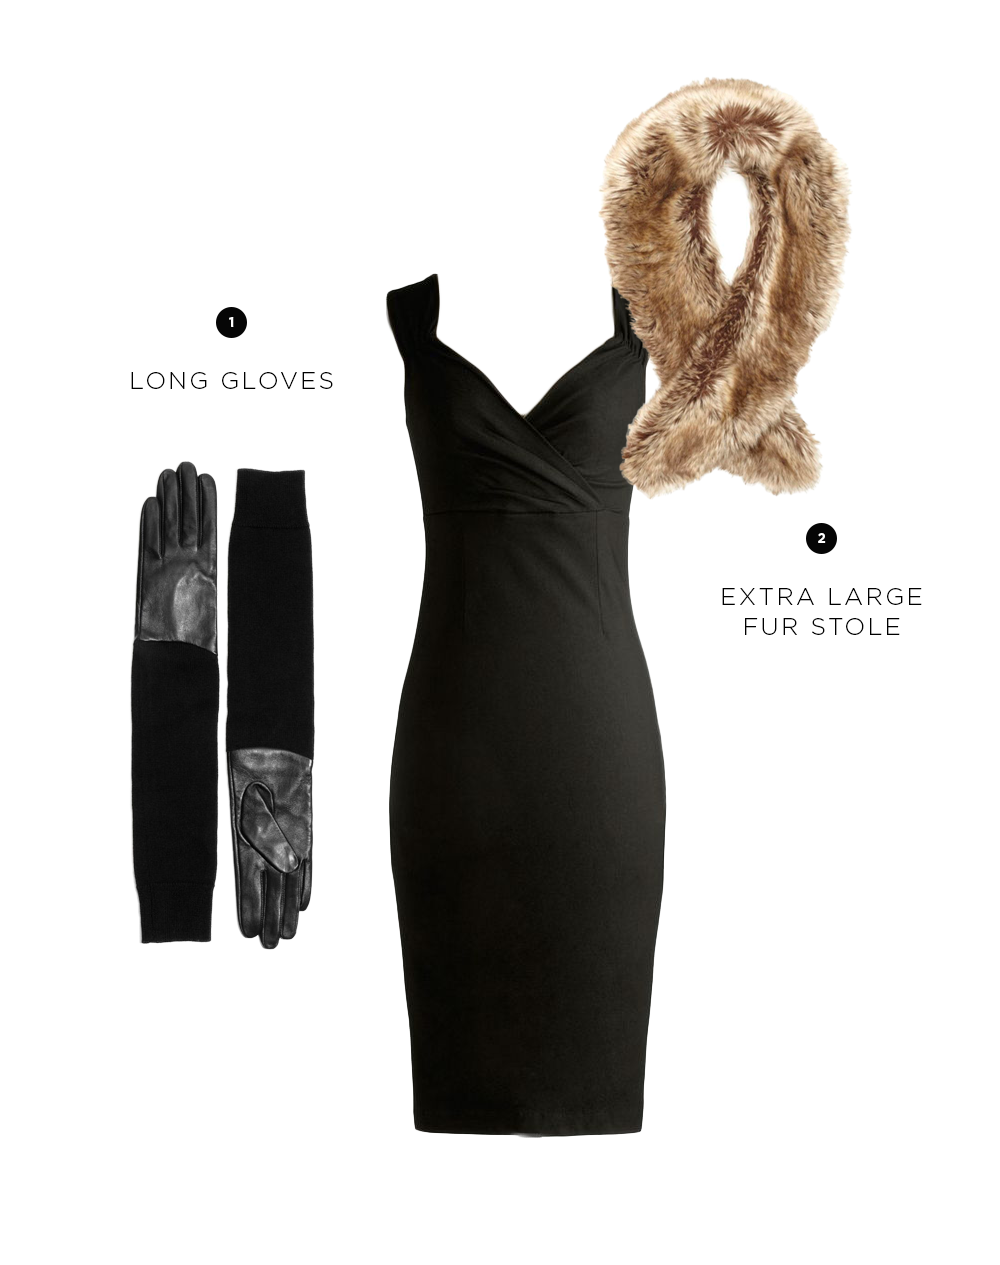 Dress: ModCloth, $90/ 1. & Other Stories, $75/ 2. Wallis, $35